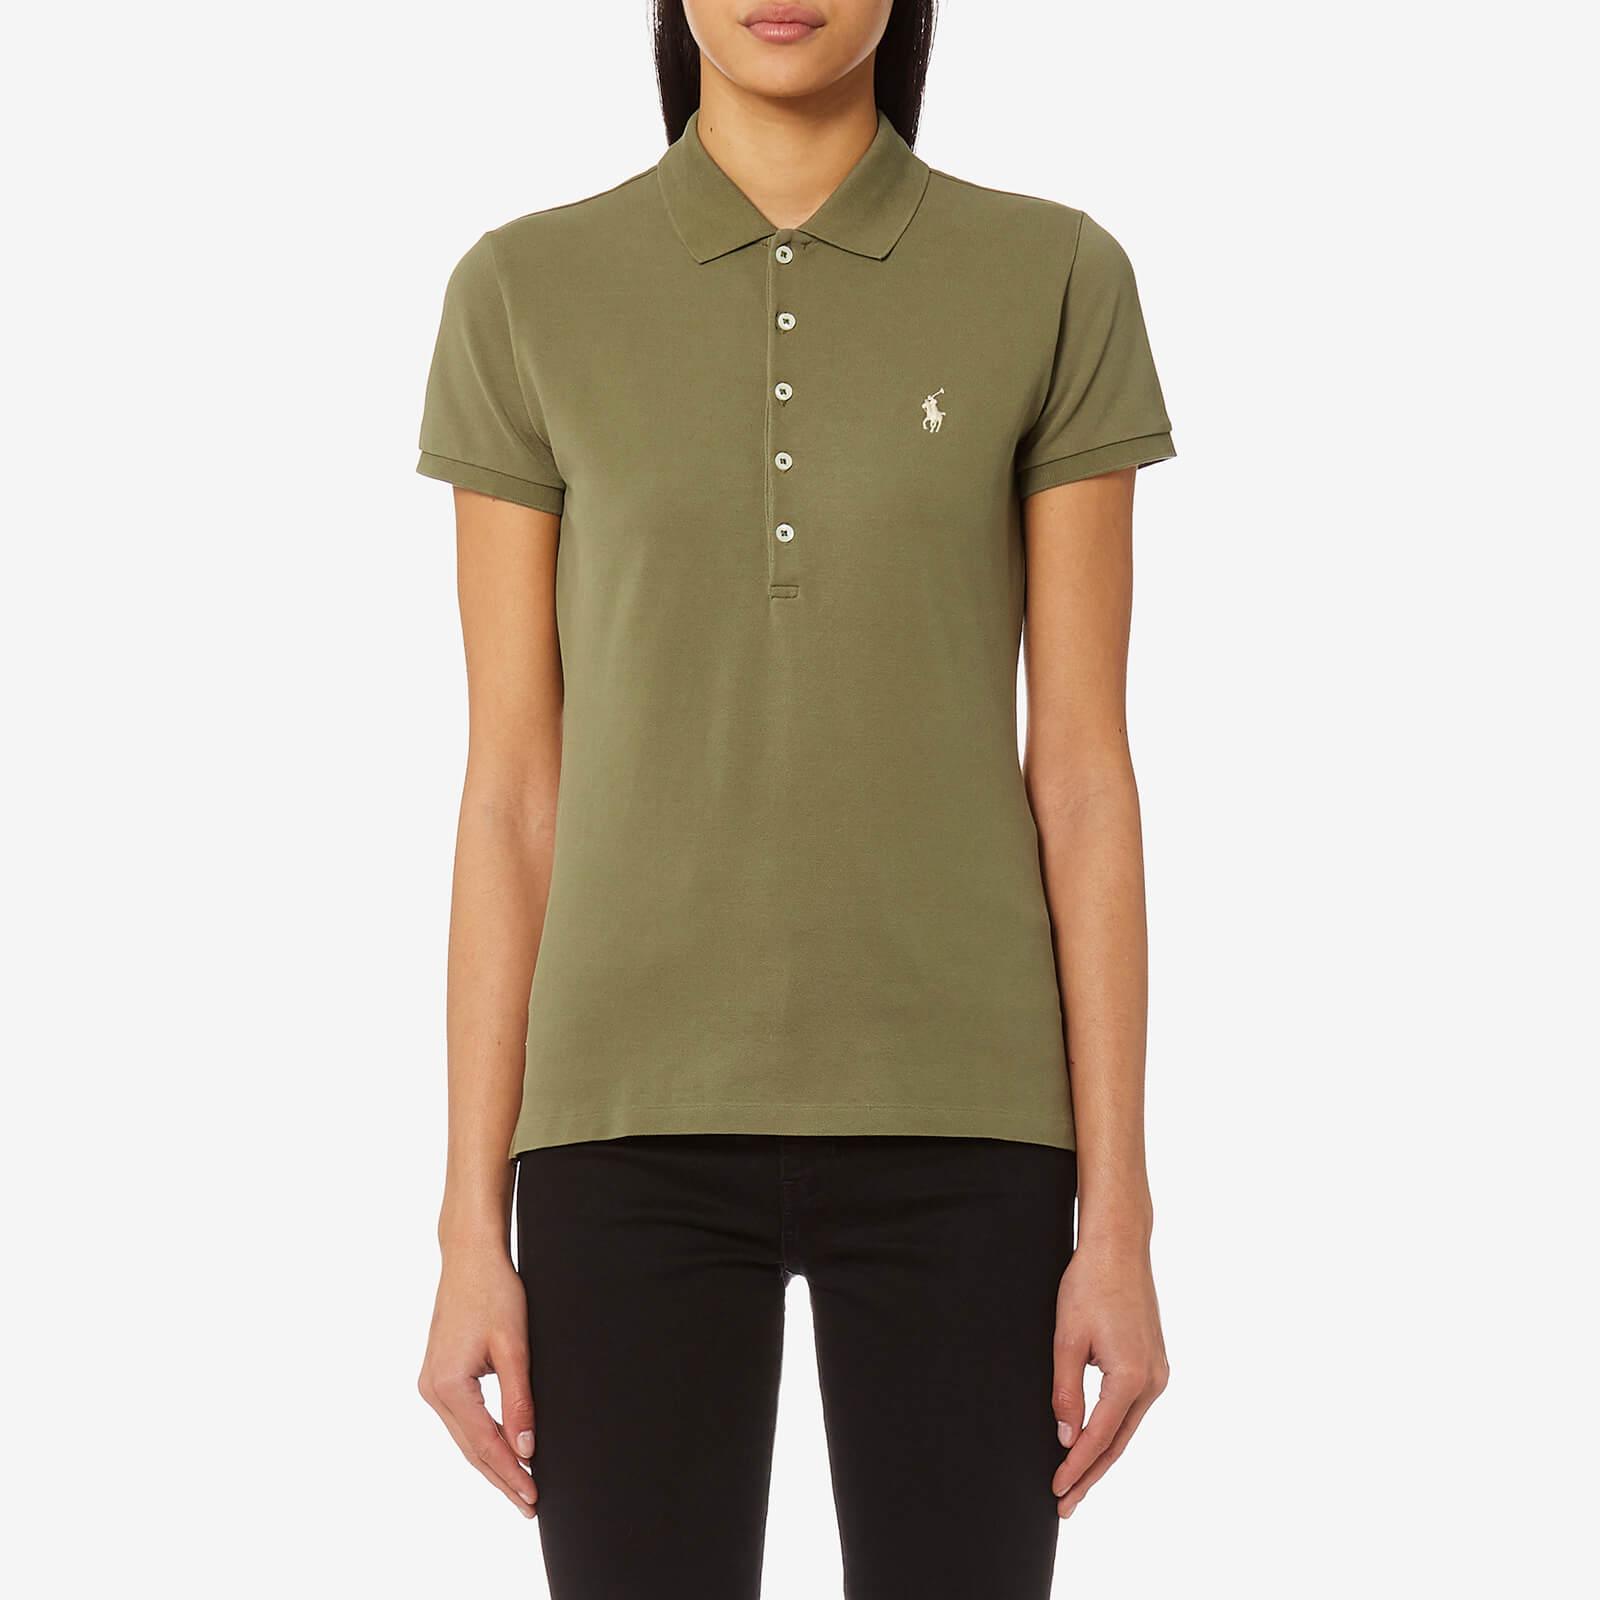 8fe0e6d31582 Polo Ralph Lauren Women's Julie T-Shirt - Khaki - Free UK Delivery over £50